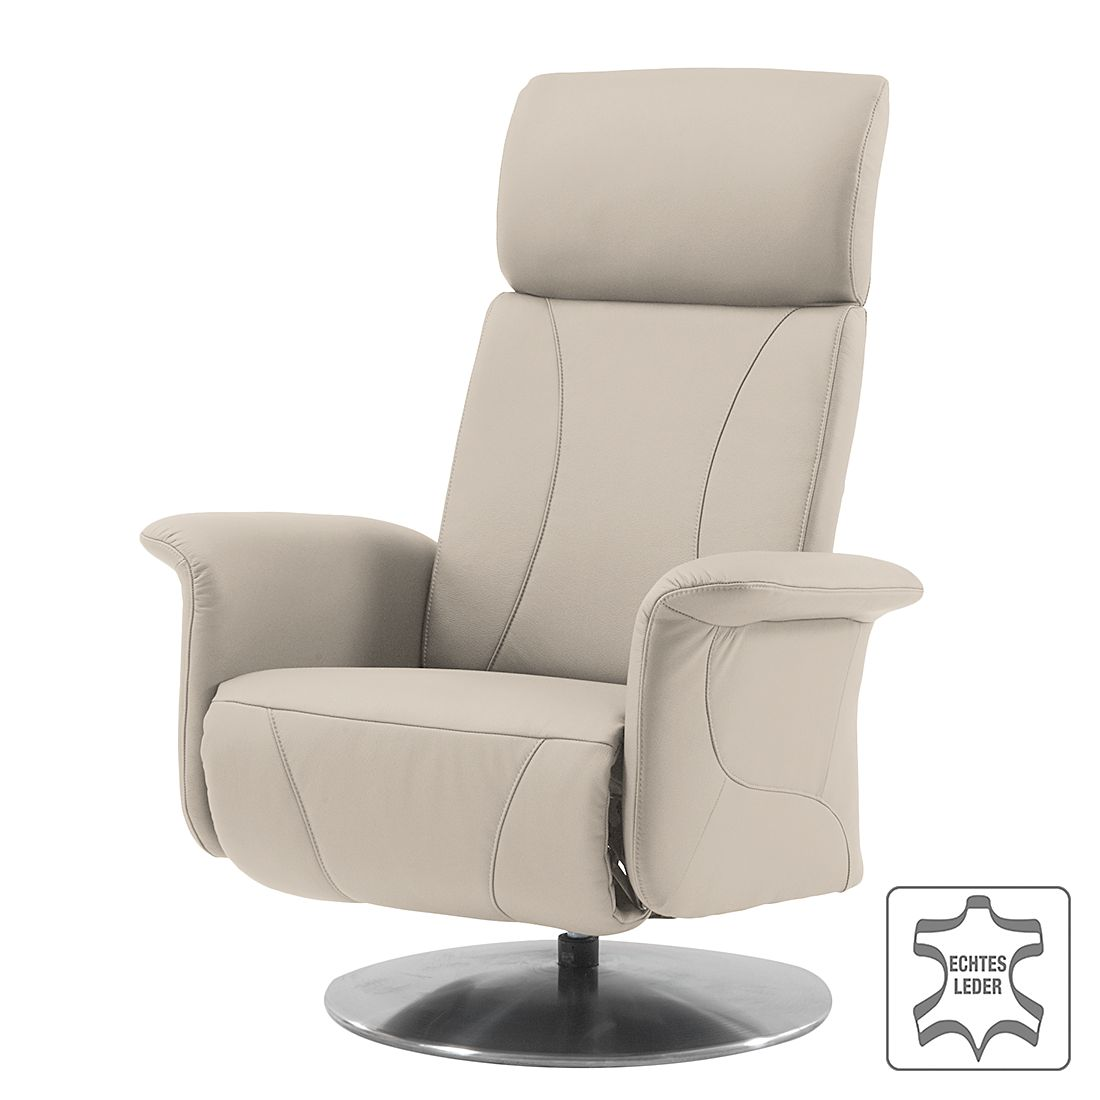 Relaxsessel Sherwin – Echtleder – Mechanische Verstellung – Beige, Nuovoform online kaufen